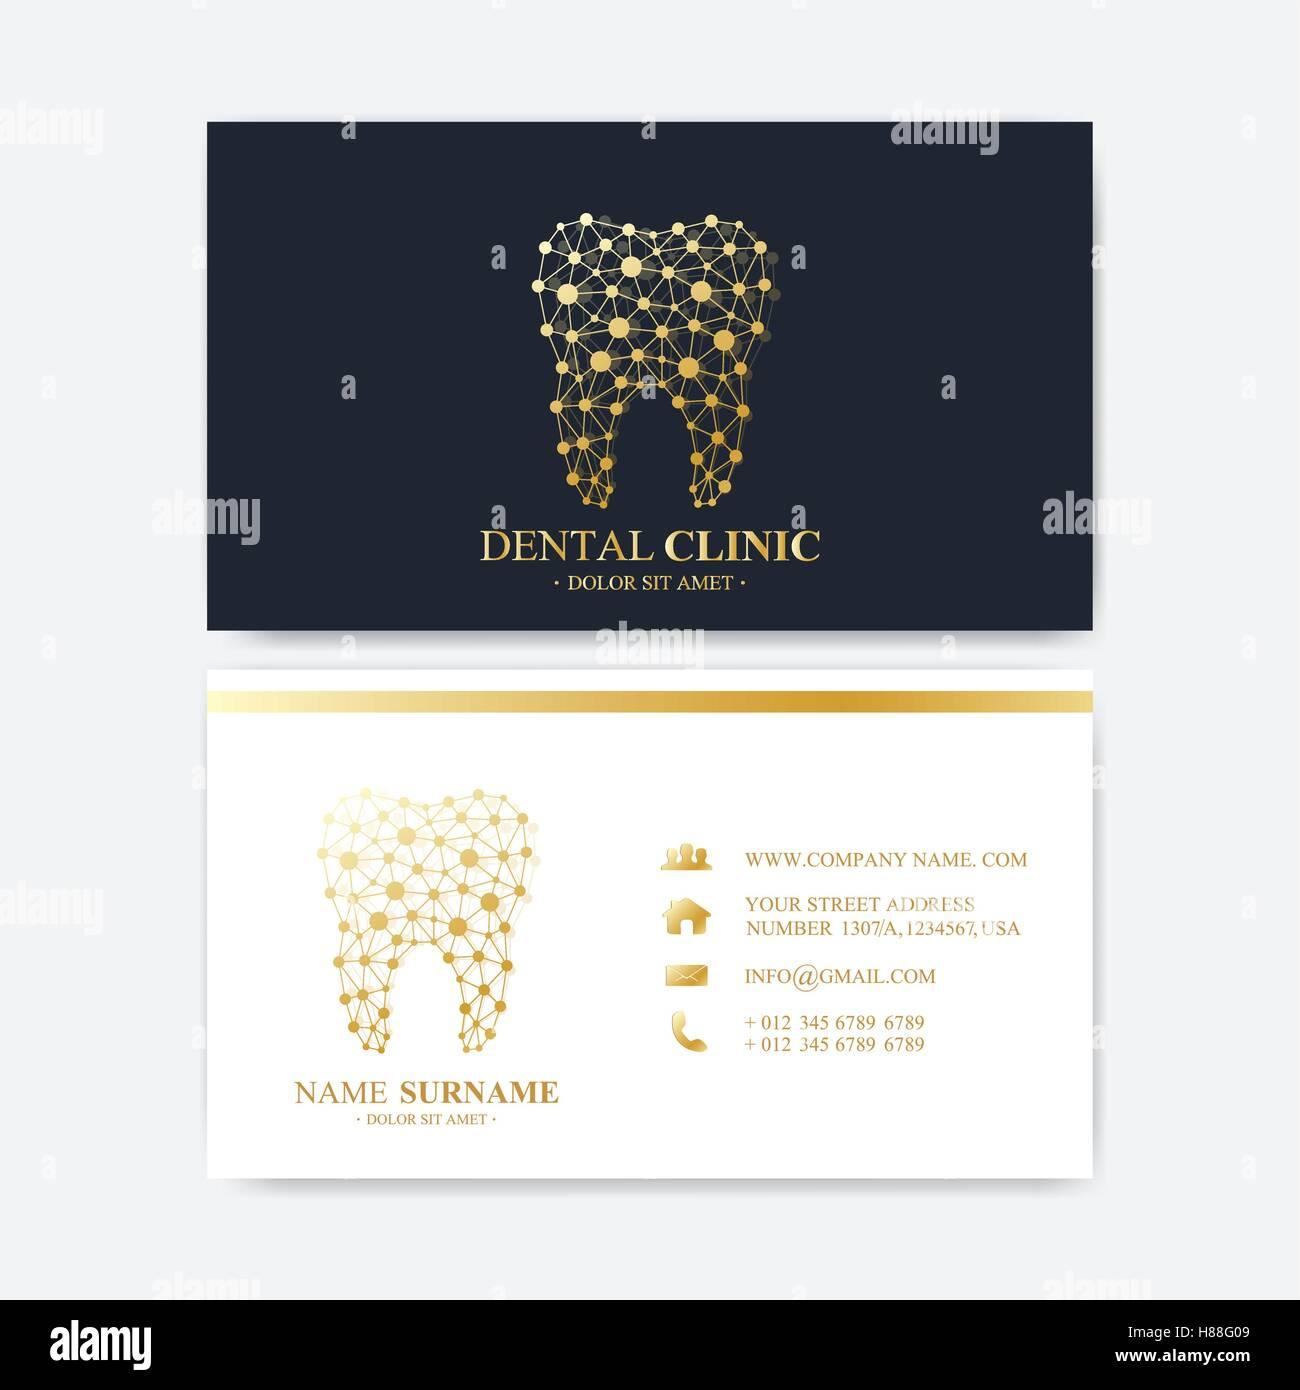 Premium Visitenkarten Druckvorlage Zahnklinik Visitenkarte